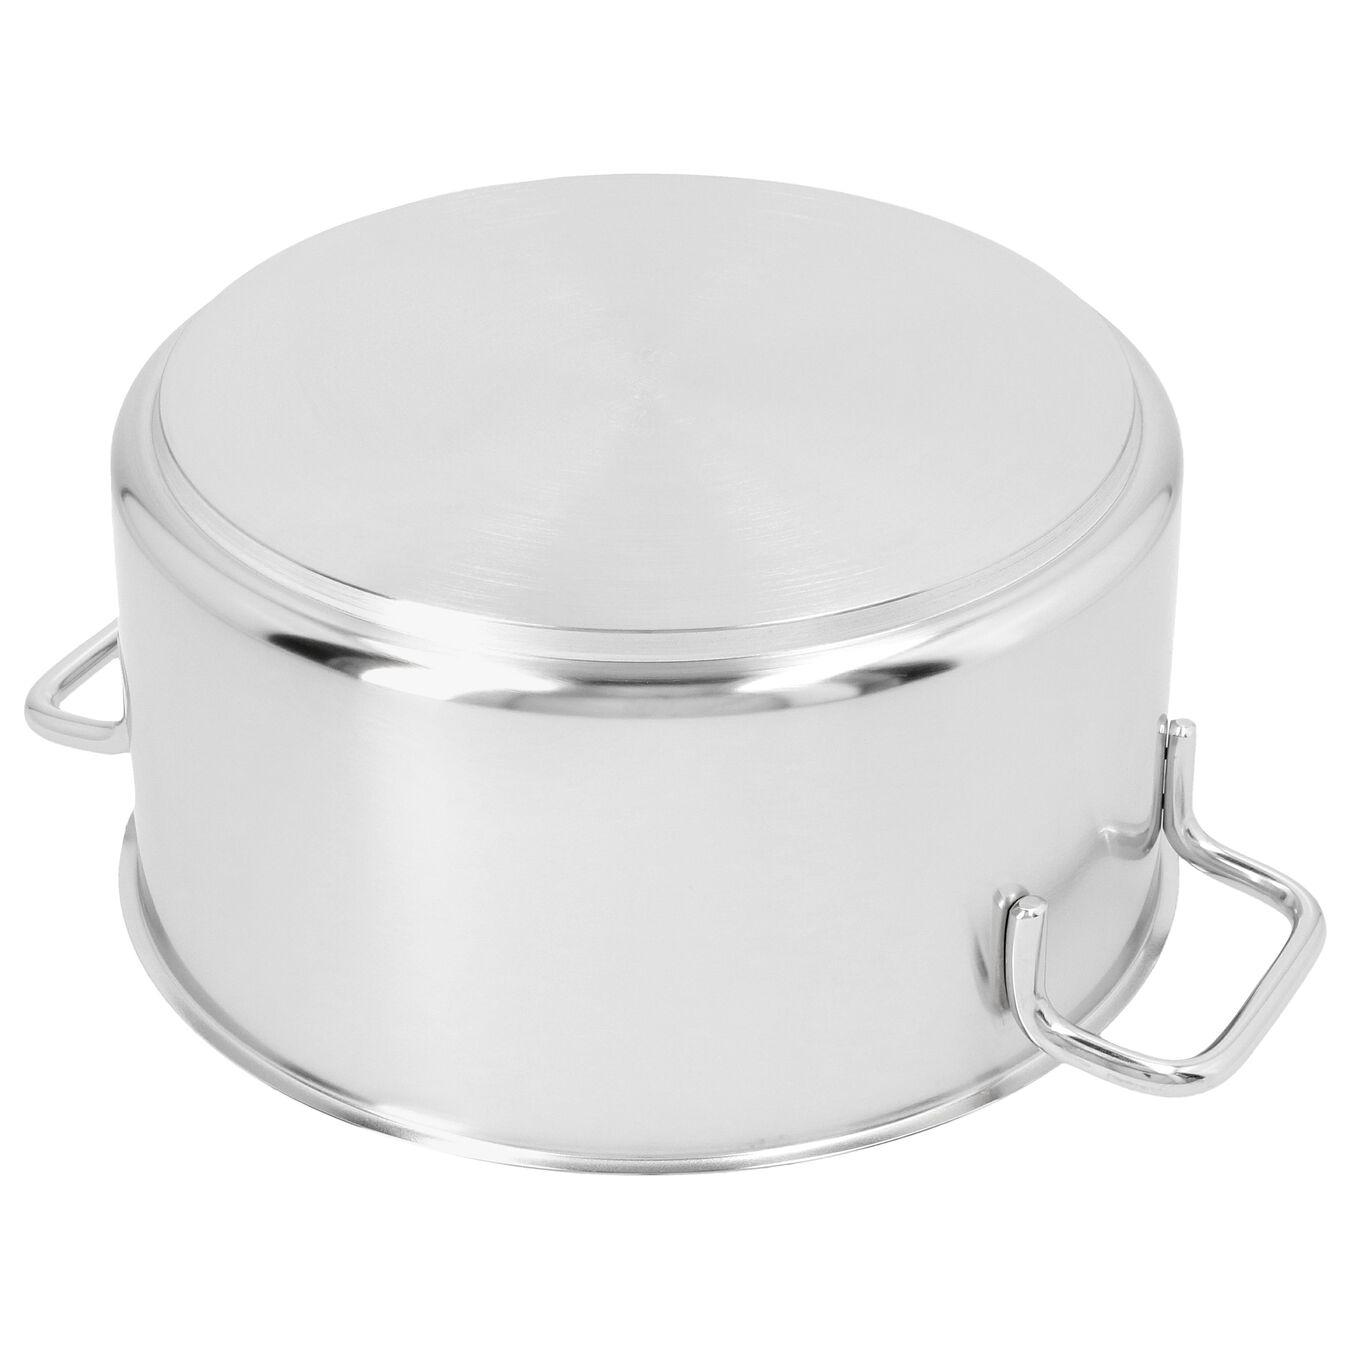 Kookpot met deksel 20 cm / 3 l,,large 2